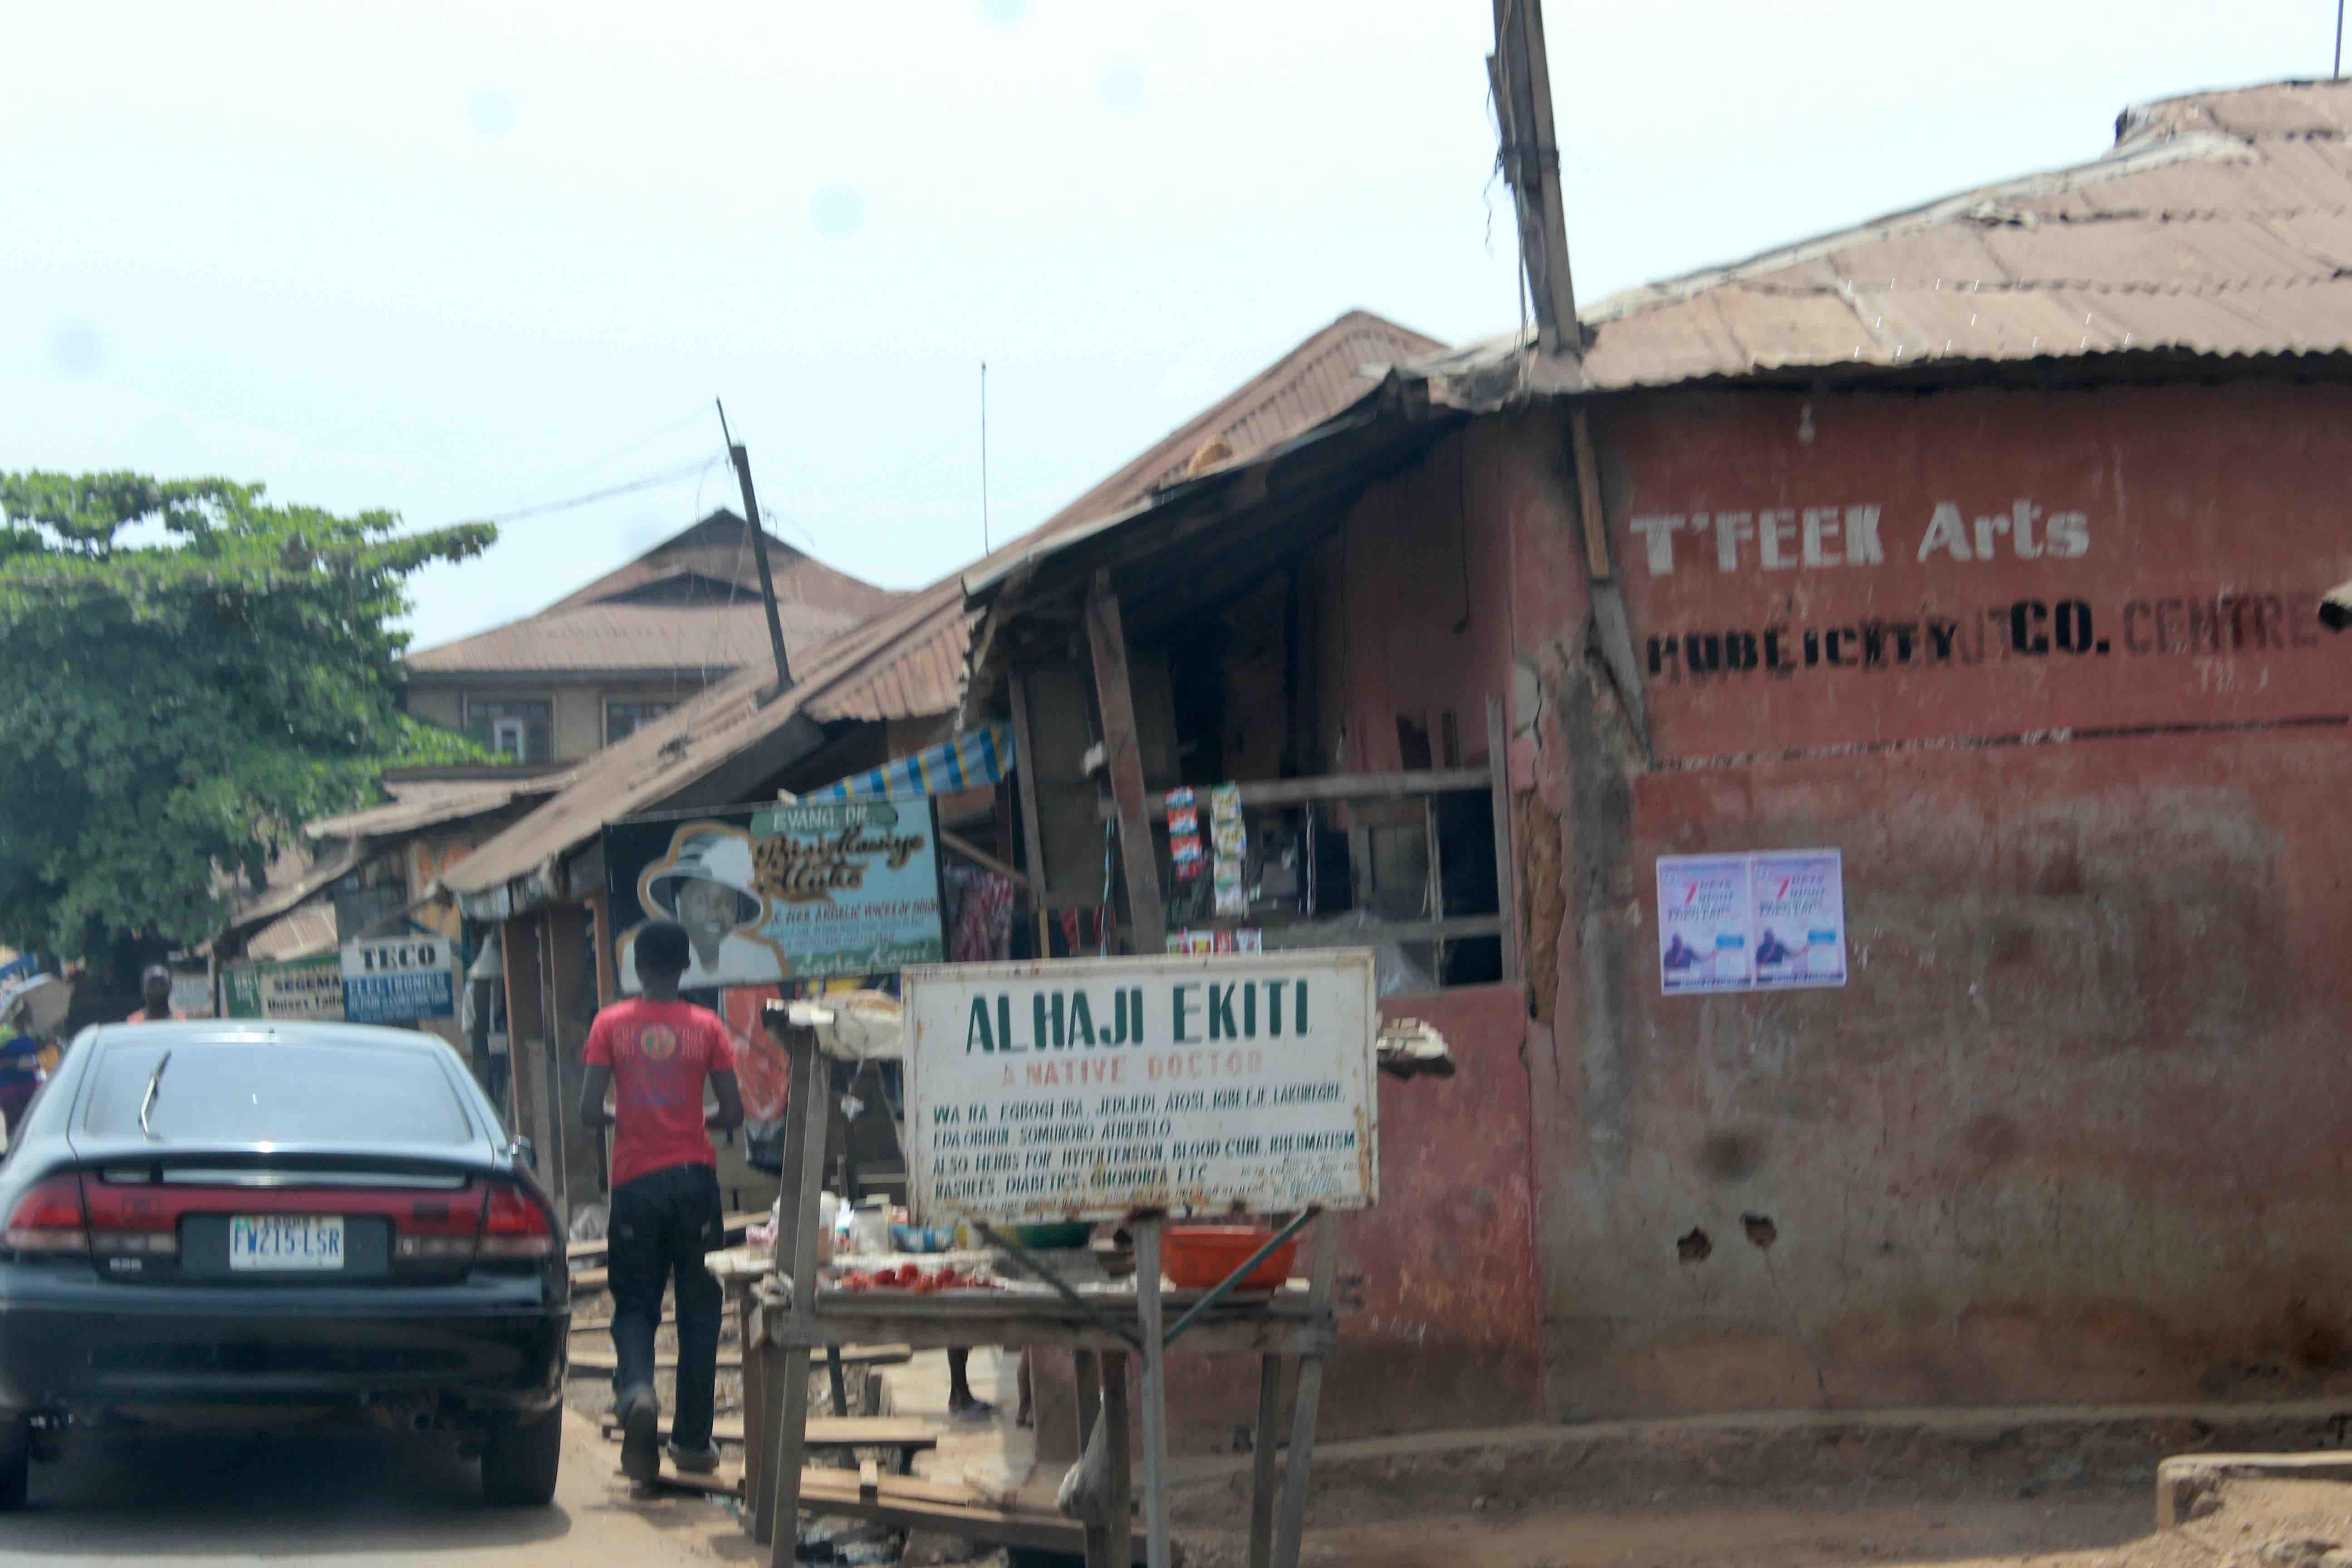 Alhaji Ekiti, Native Doctor, Ilesa, Osun State, Nigeria. #JujuFilms